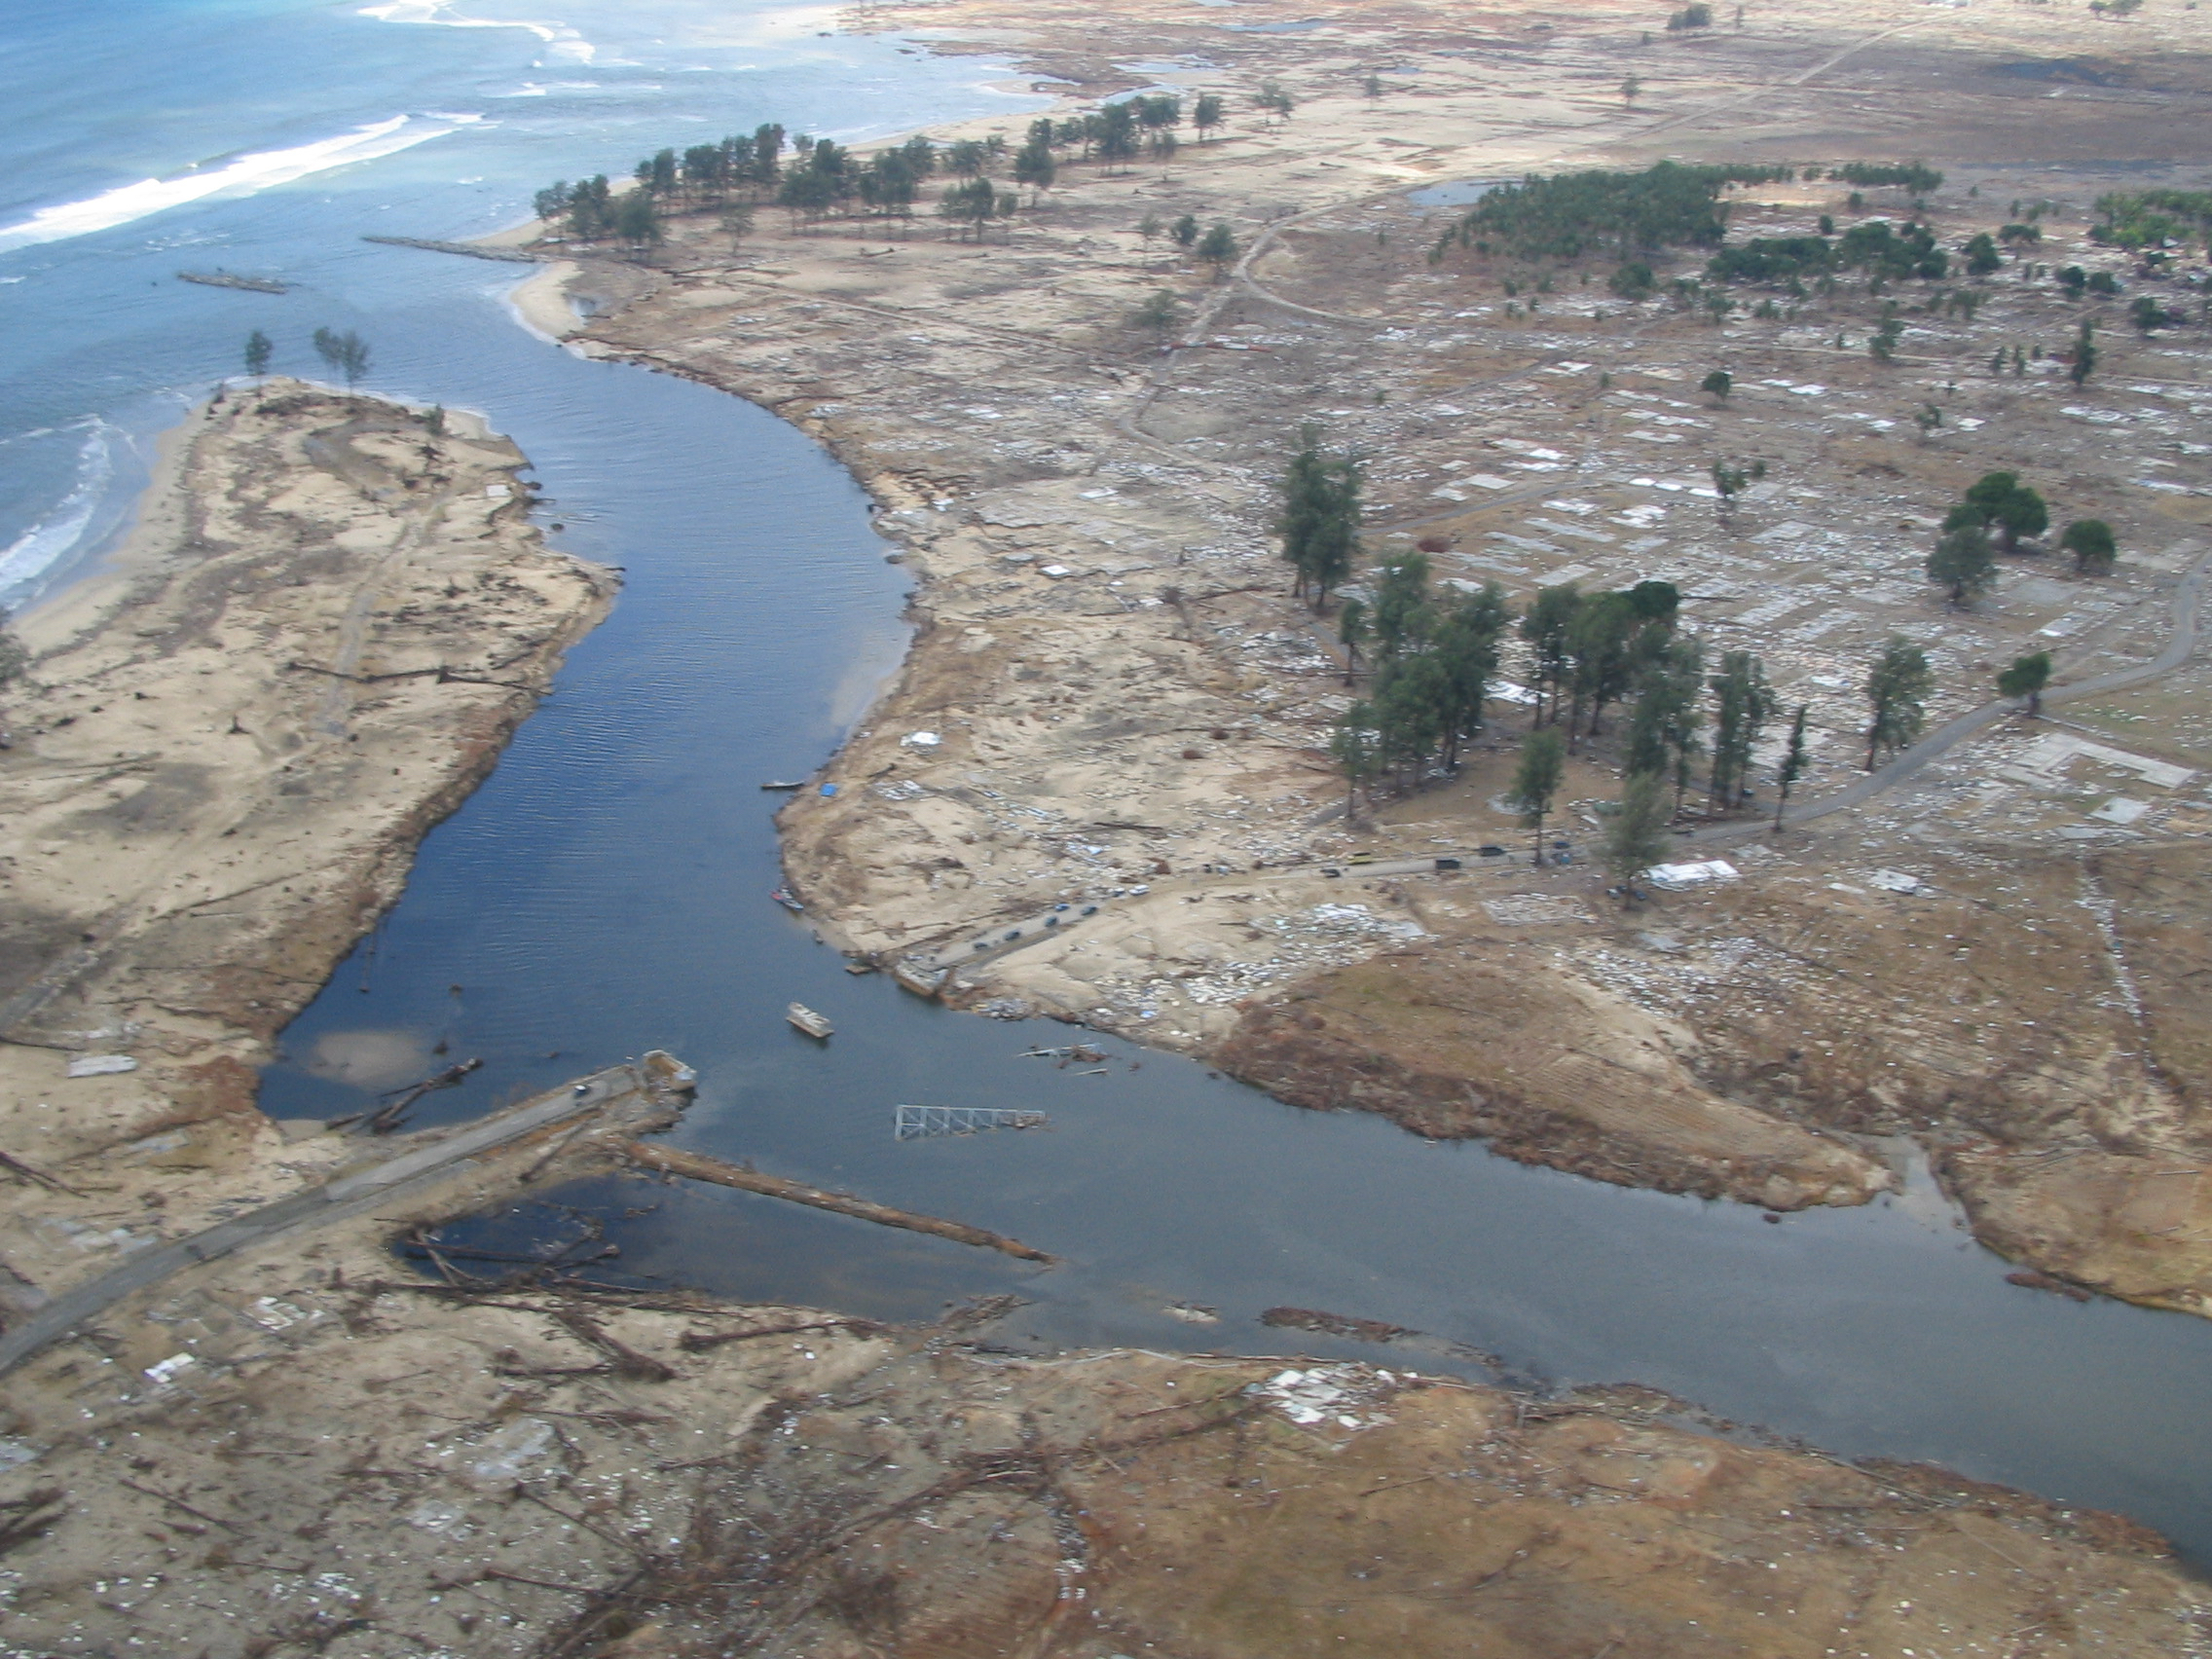 2004 Indian Ocean earthquake - New World Encyclopedia